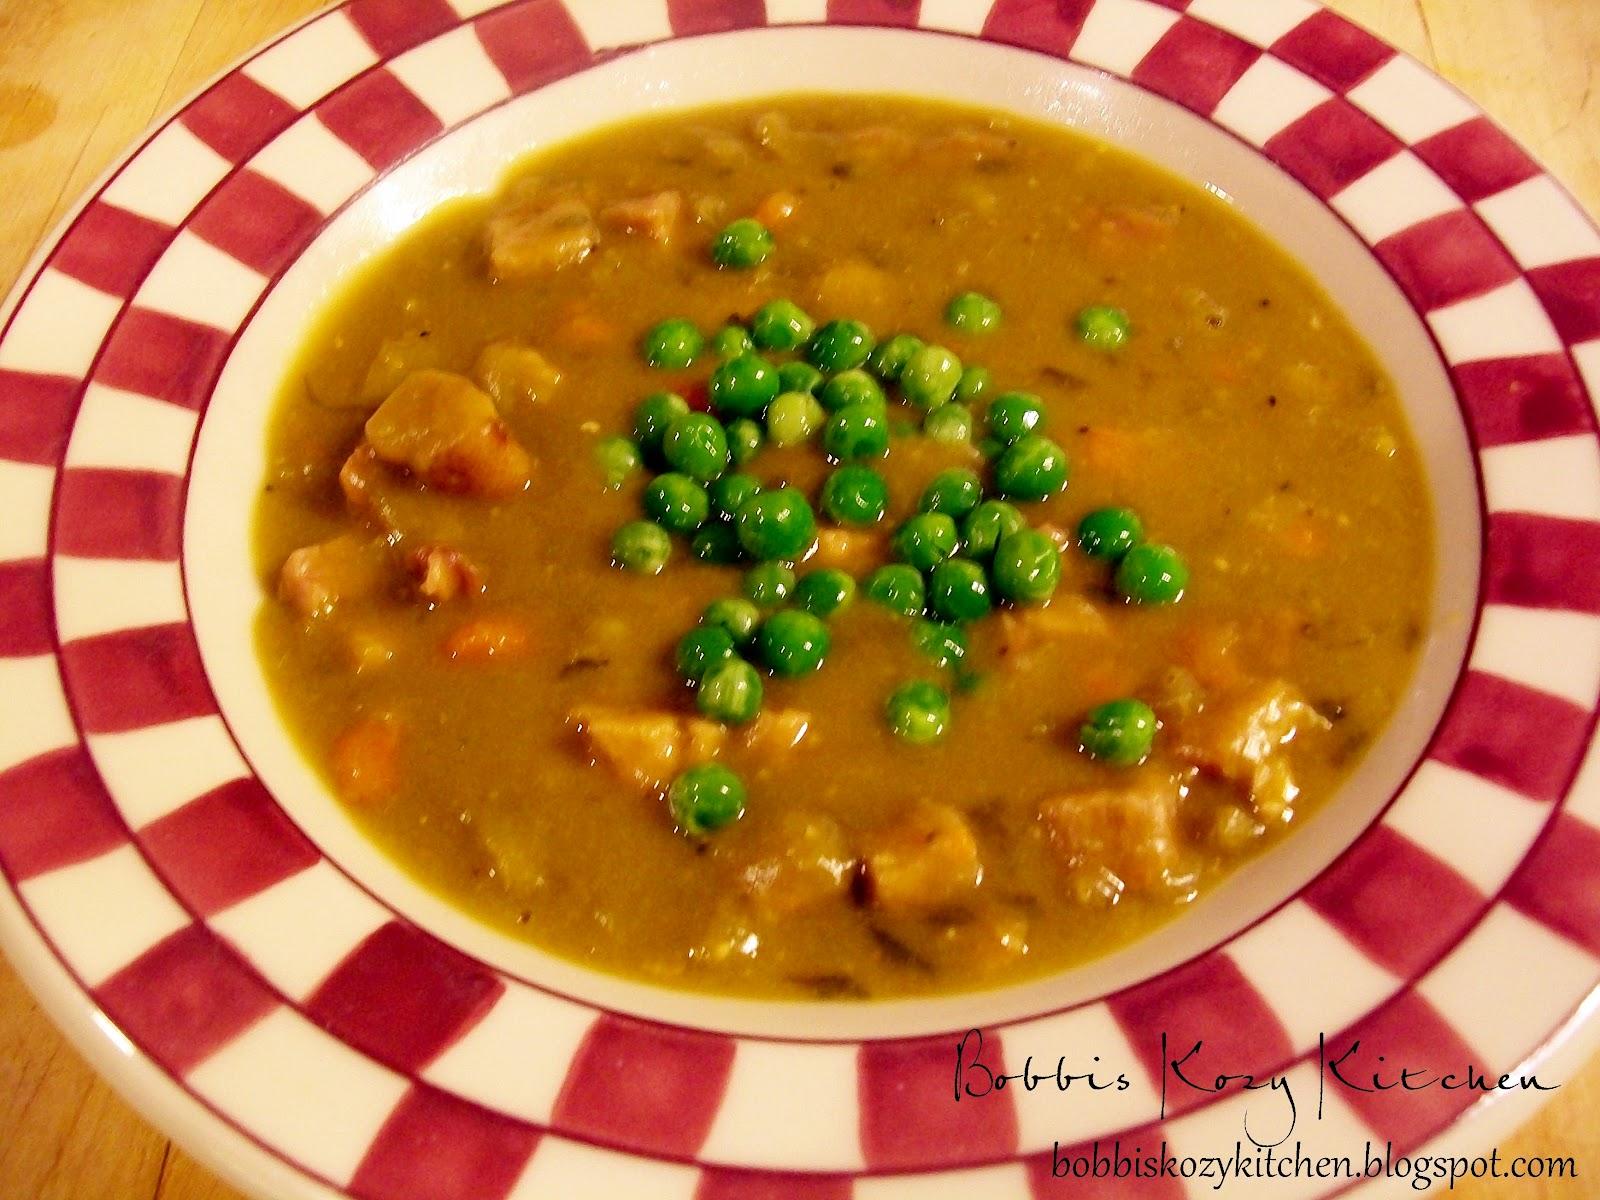 ... Kozy Kitchen: Bobbi on a Budget - Slow Cooker Split Pea Soup with Ham